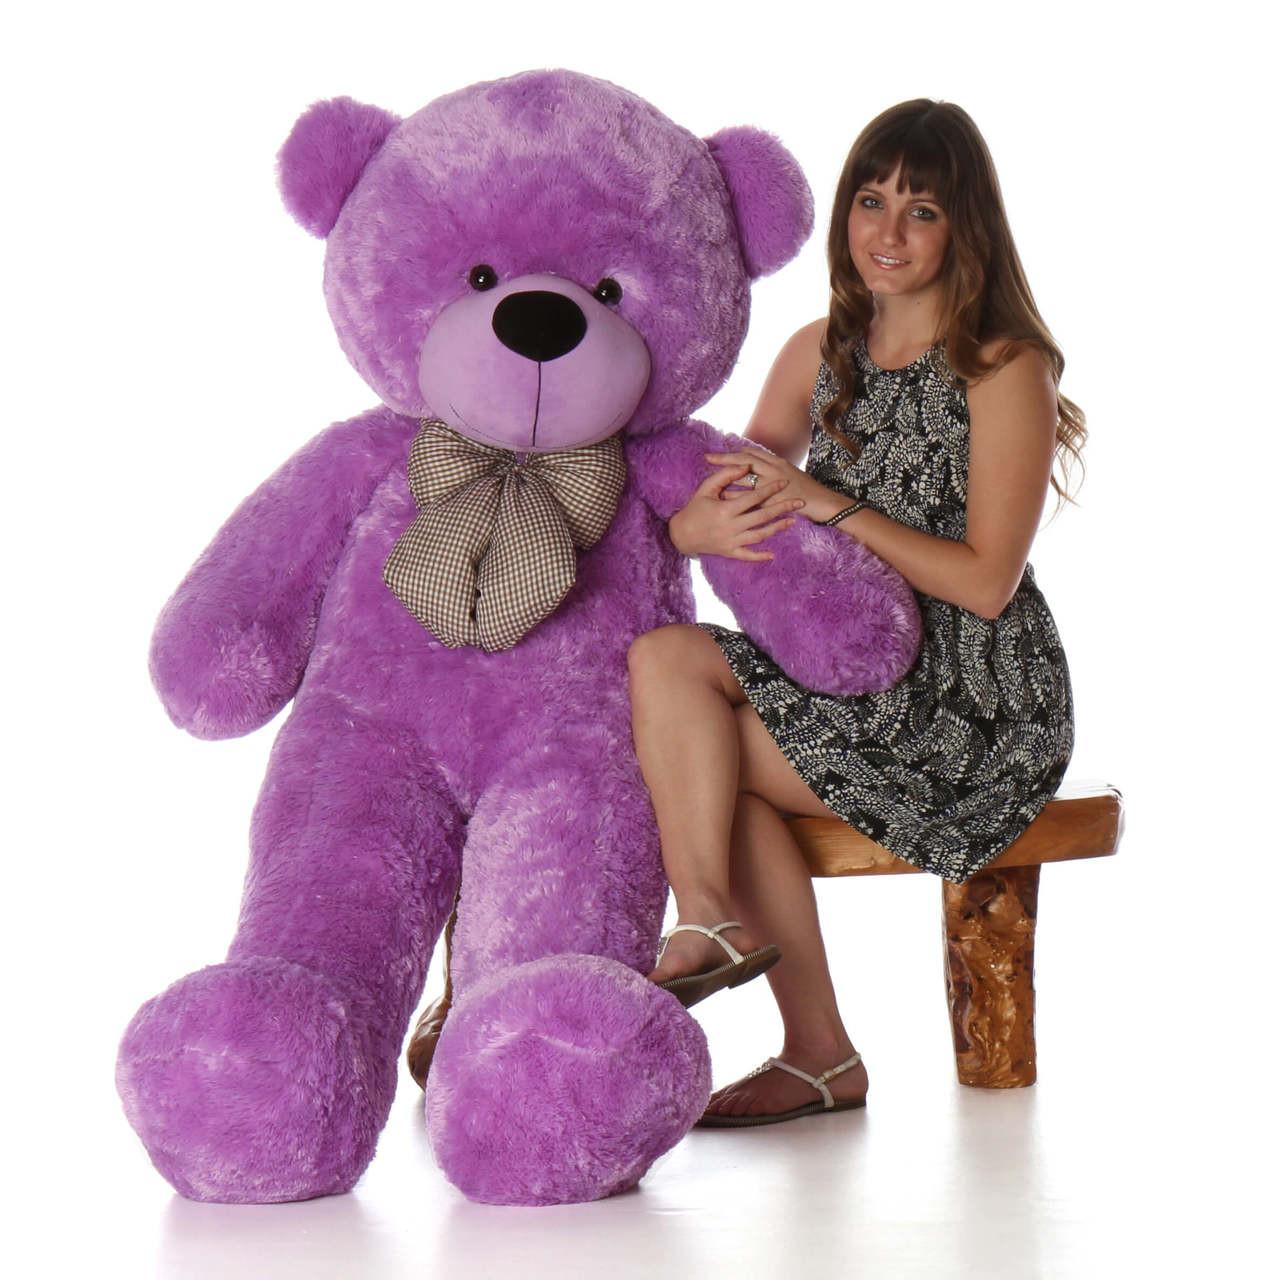 Deedee cuddles 55 lilac huge plush teddy bear giant purple 60in best selling life size purple teddy bear deedee cuddles voltagebd Image collections